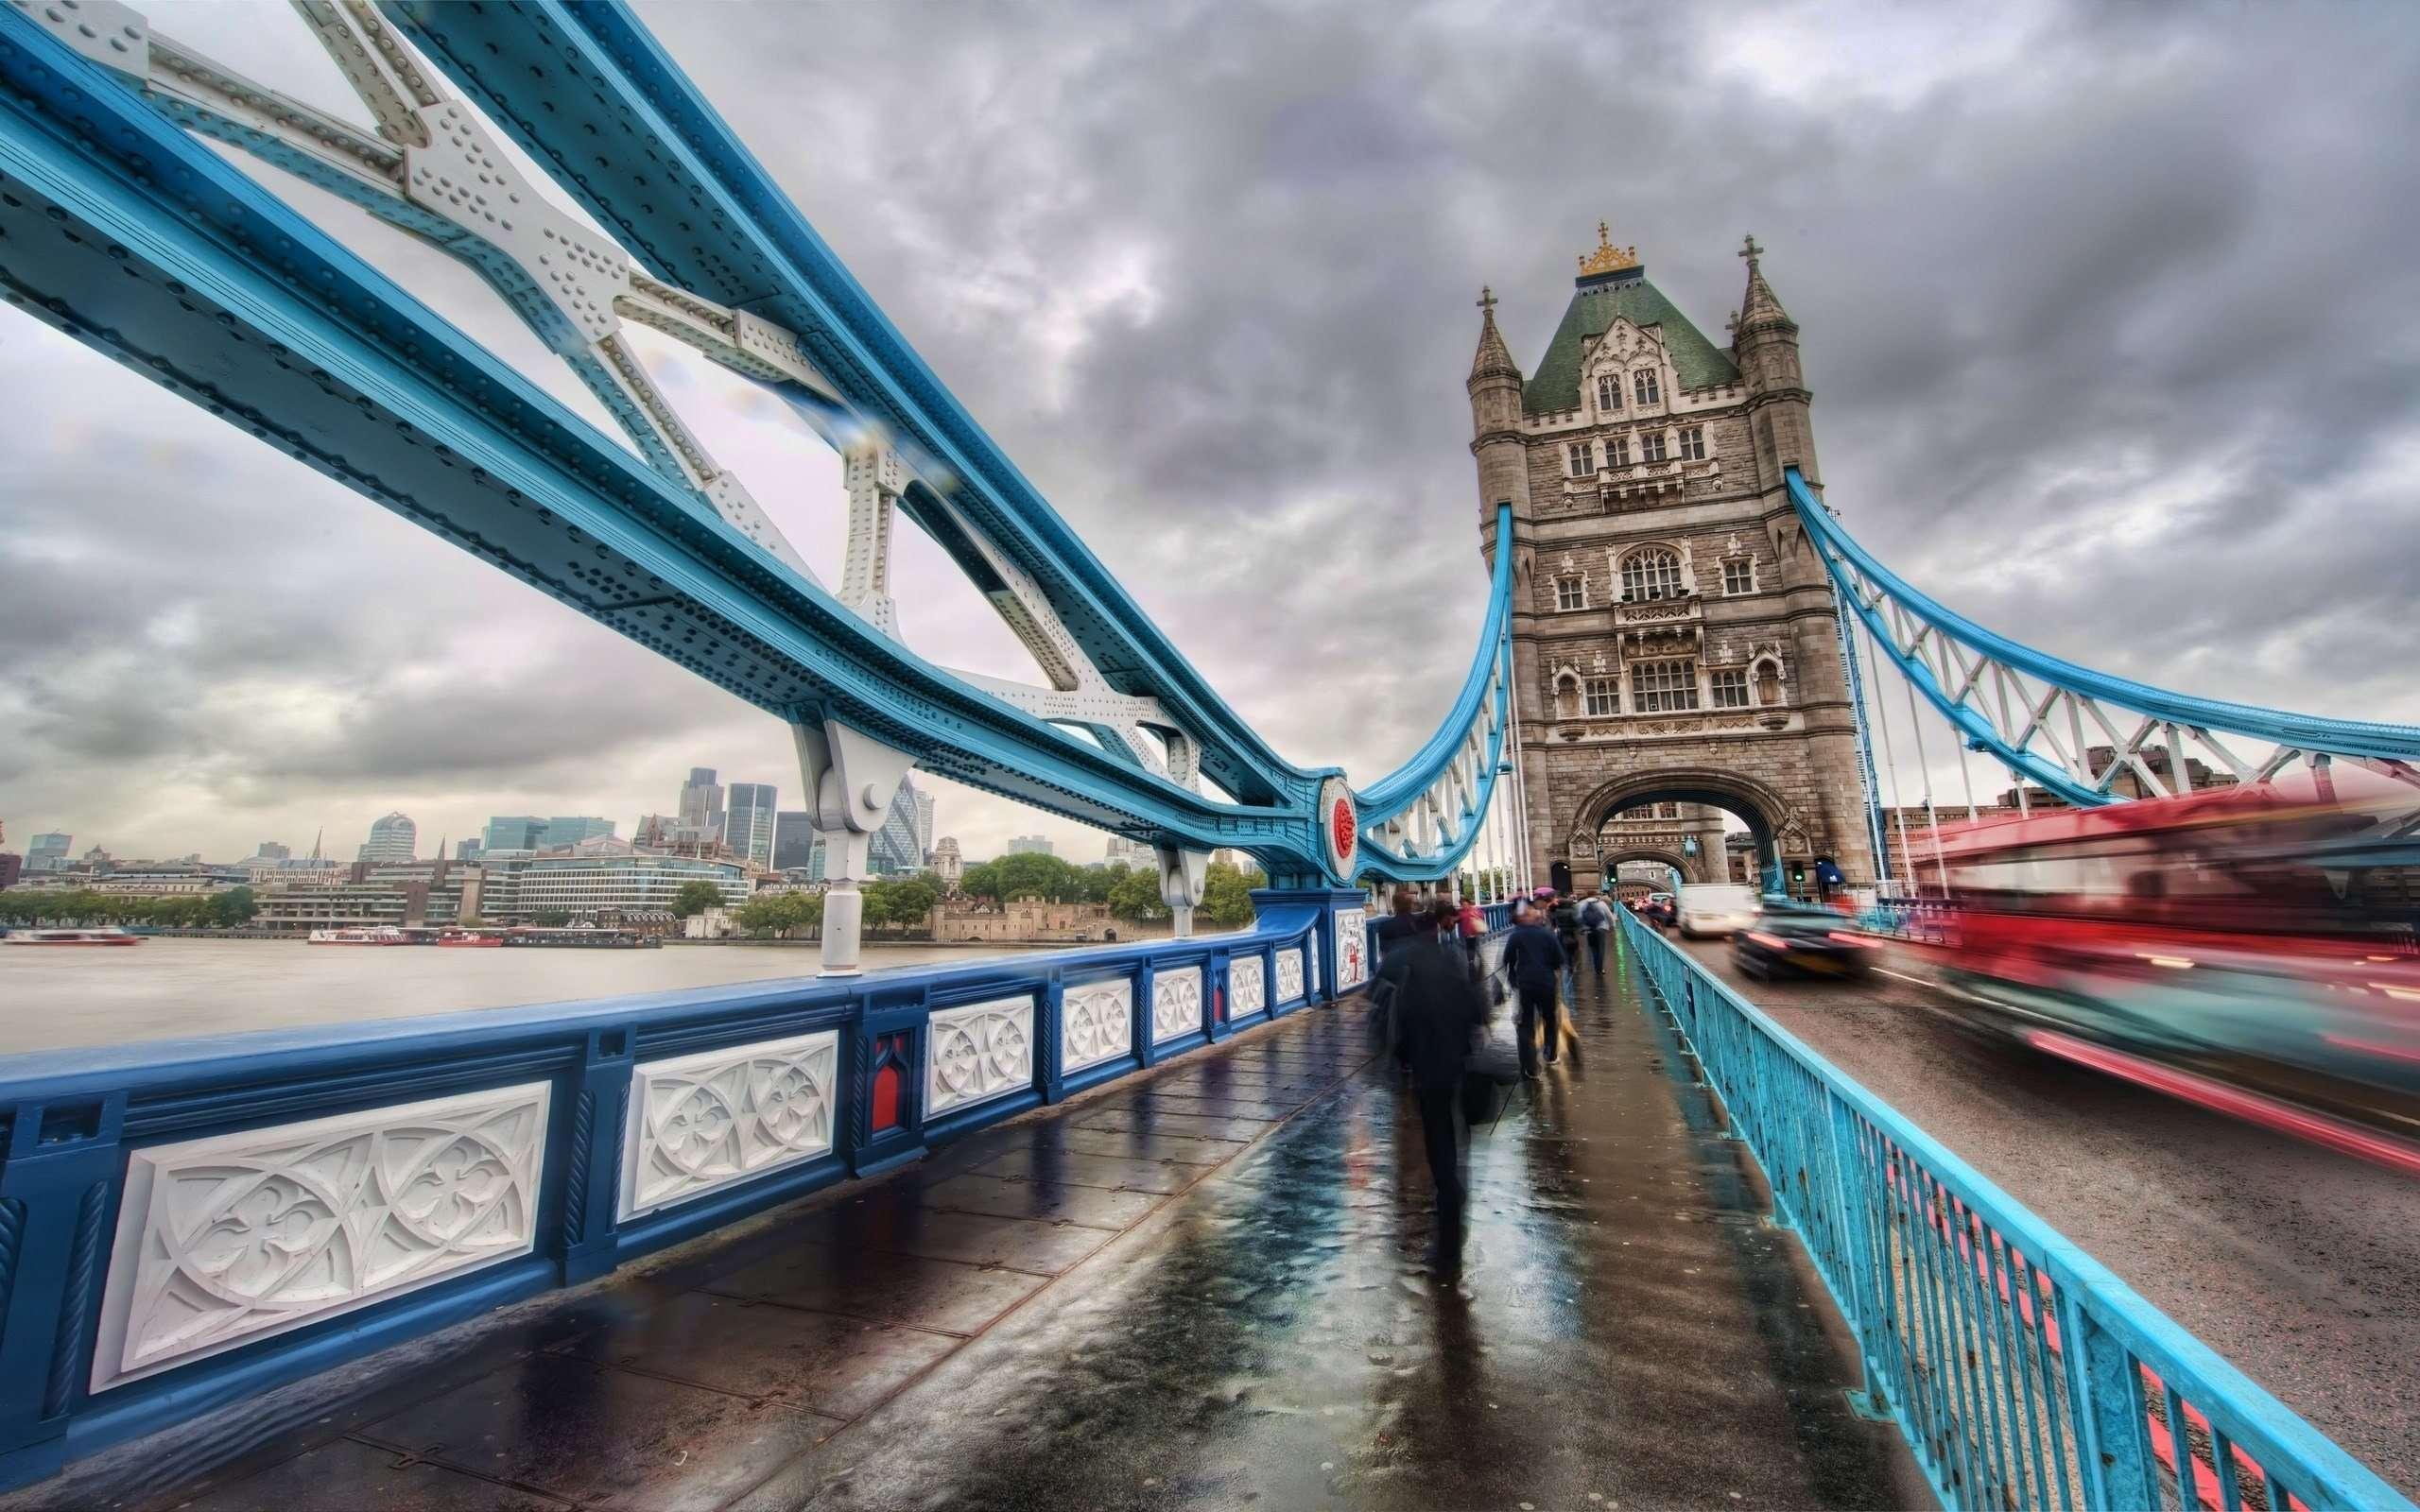 London bridge wallpapers wallpaper cave - Bridge wallpaper hd ...